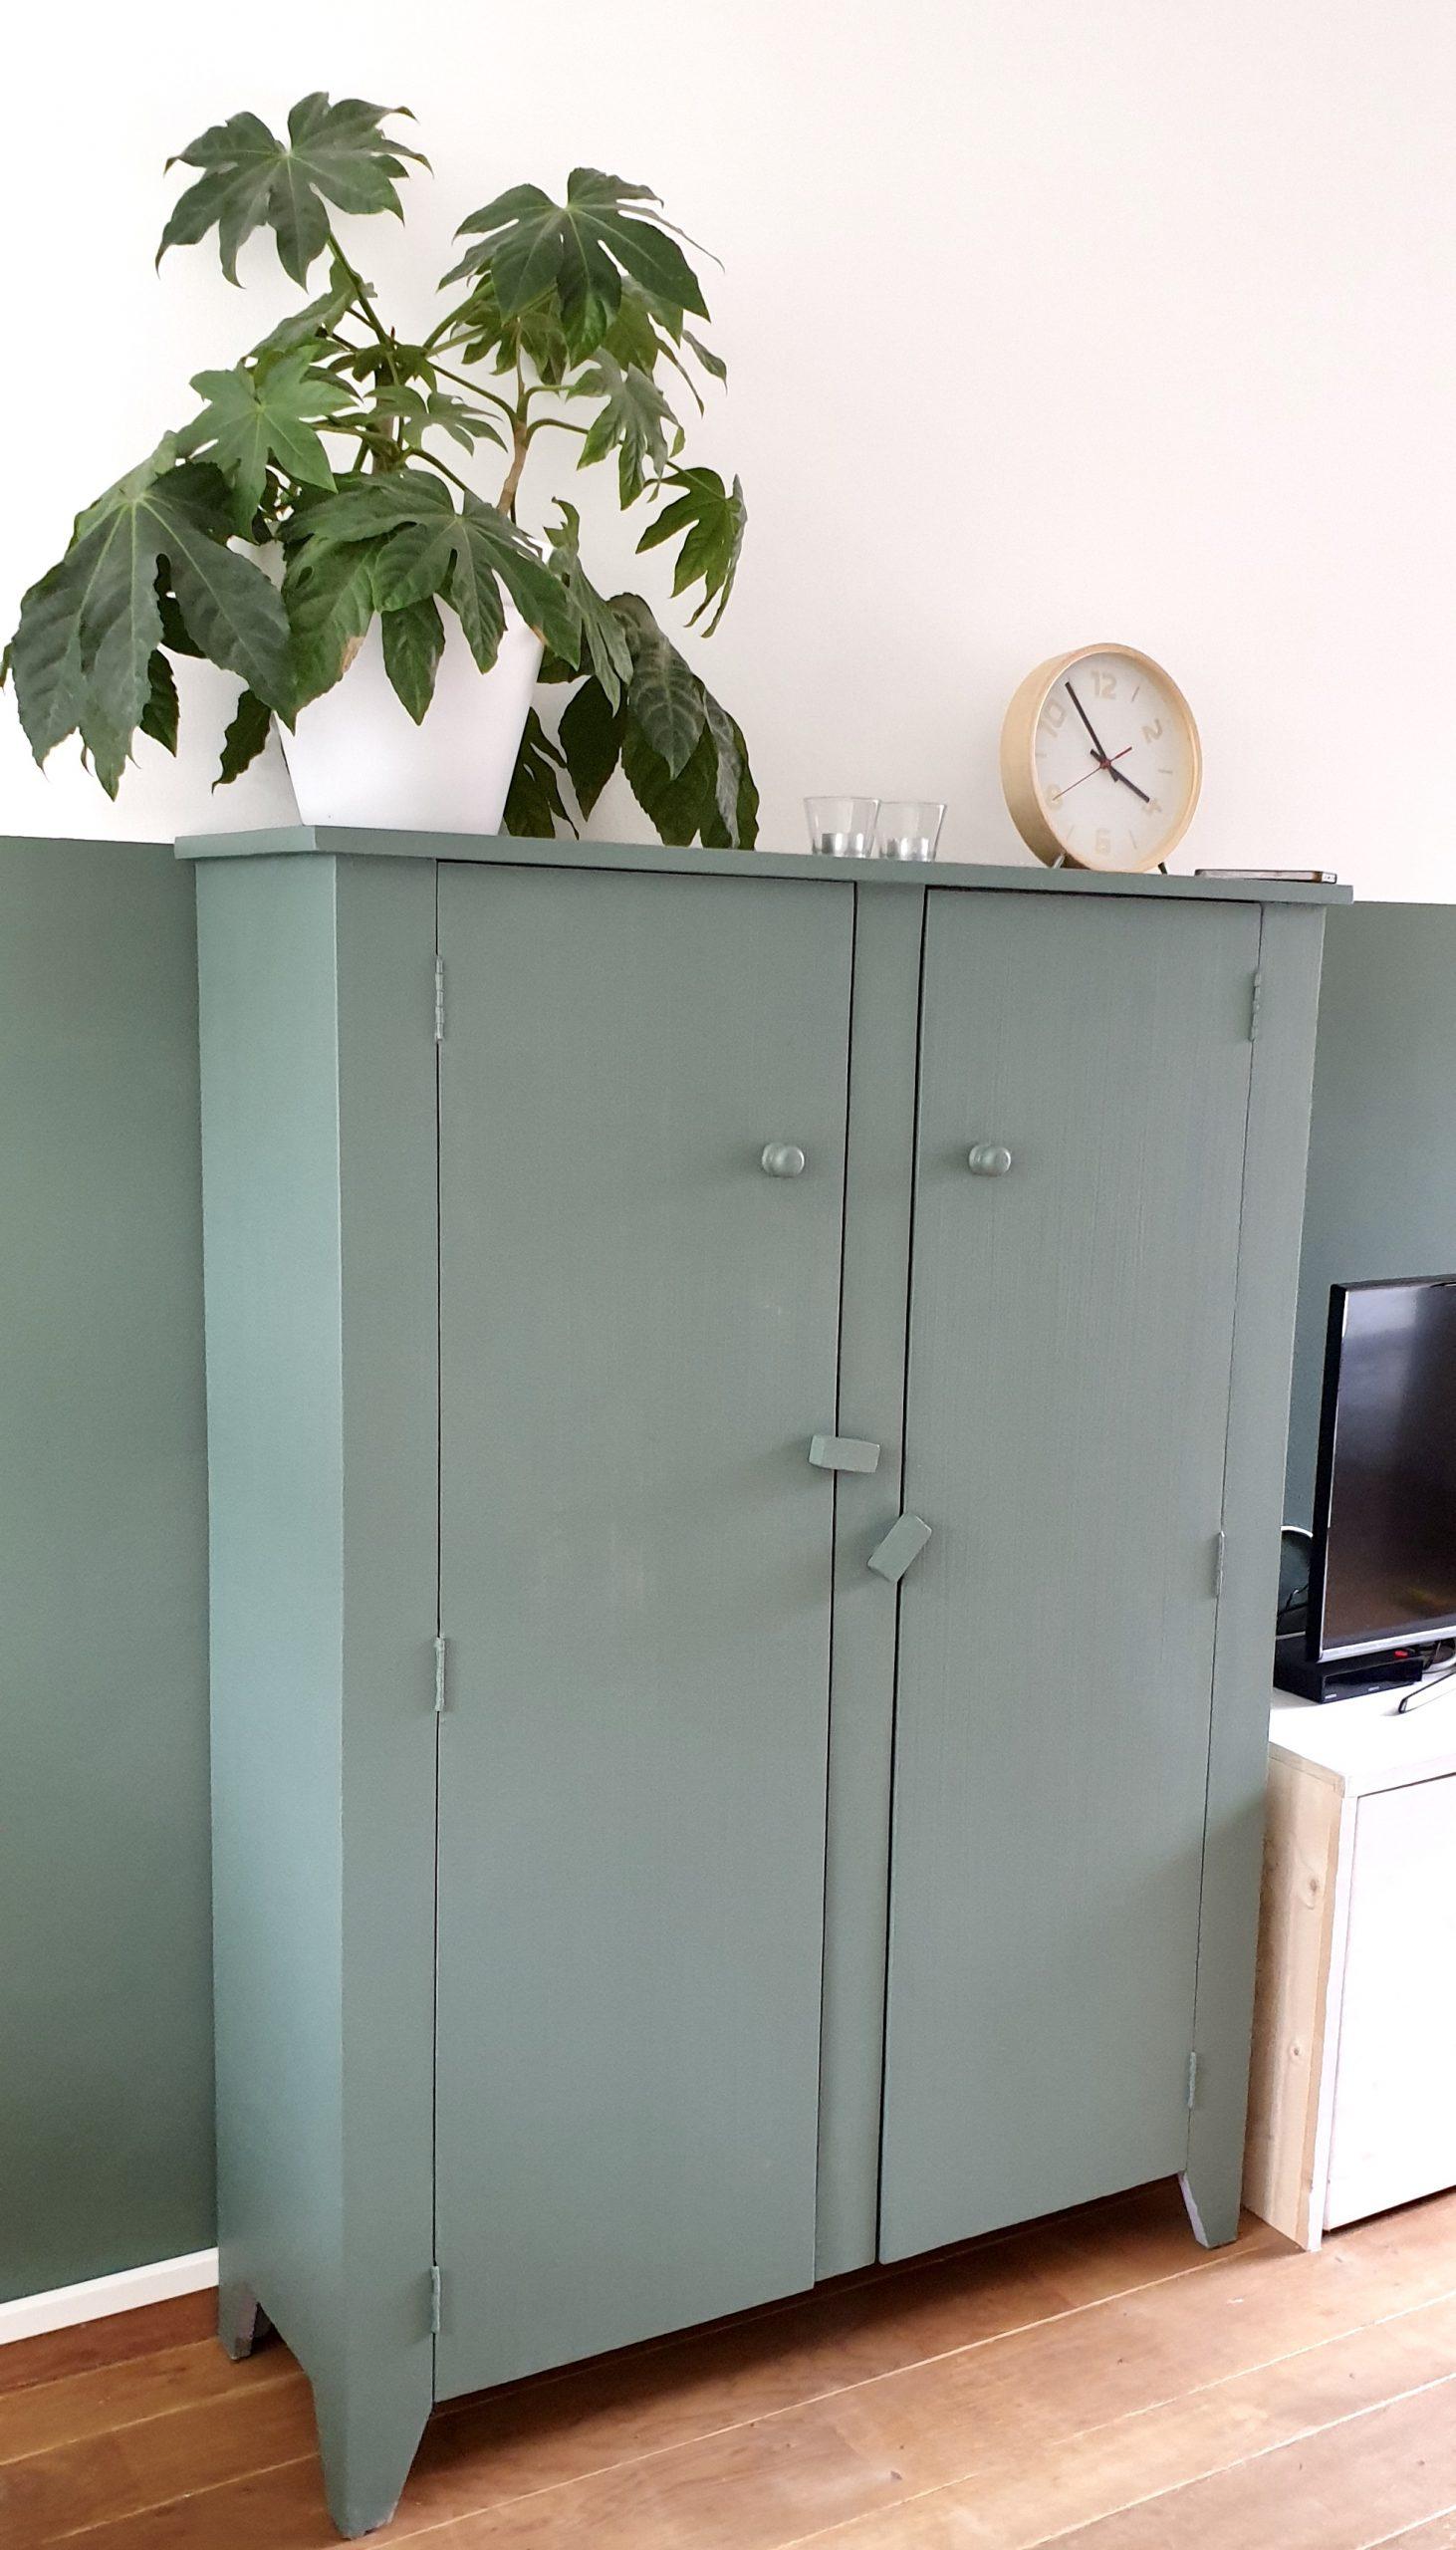 Interieuradvies - interieur - stylingadvies - huiskamer met speelhoek - Zwolle interieurstyling